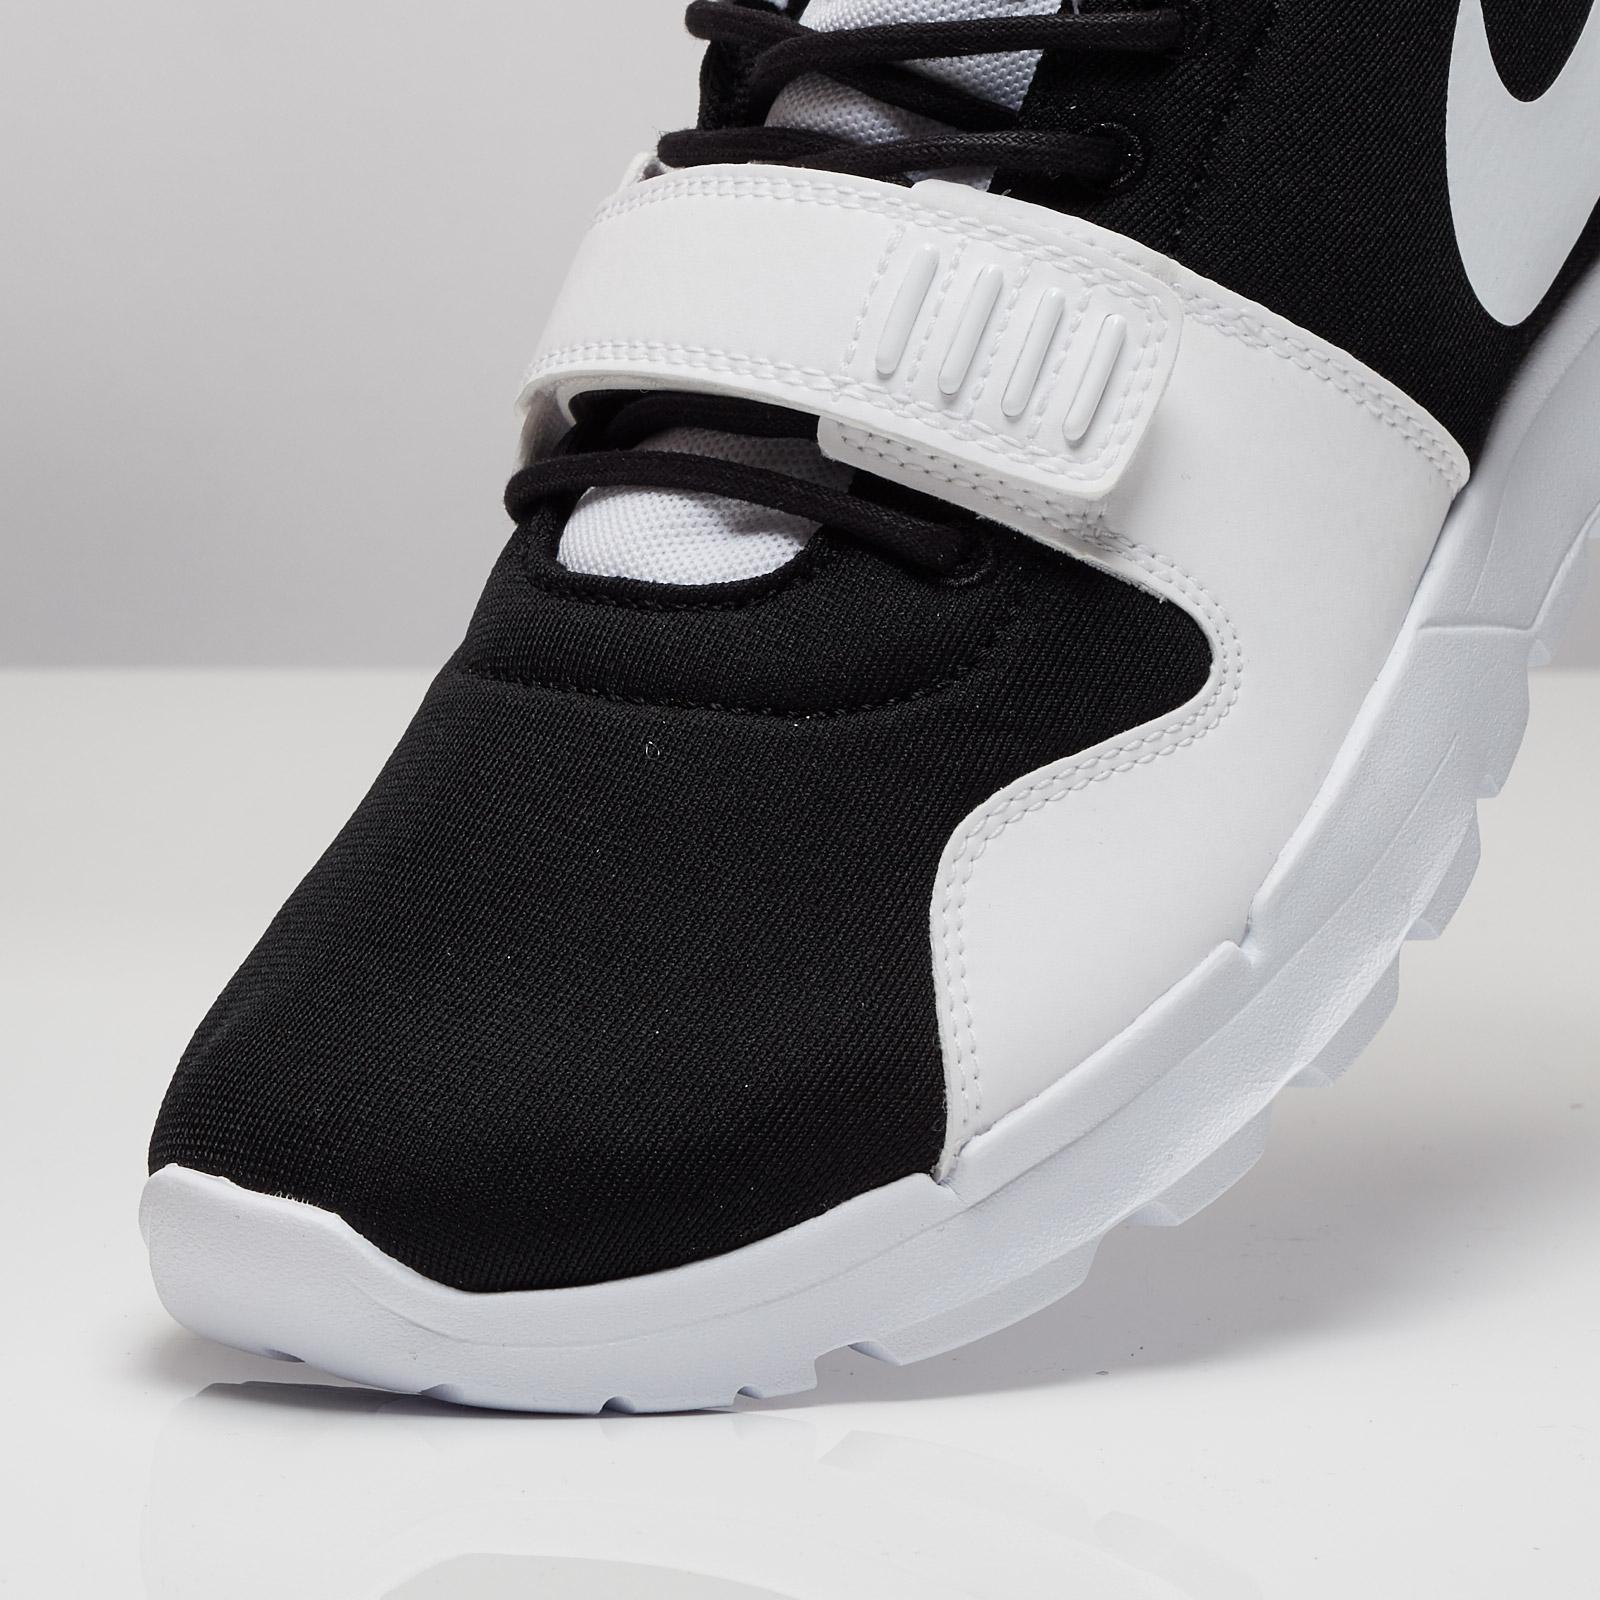 quality design 9f389 94f62 ... Nike Trainerendor SB